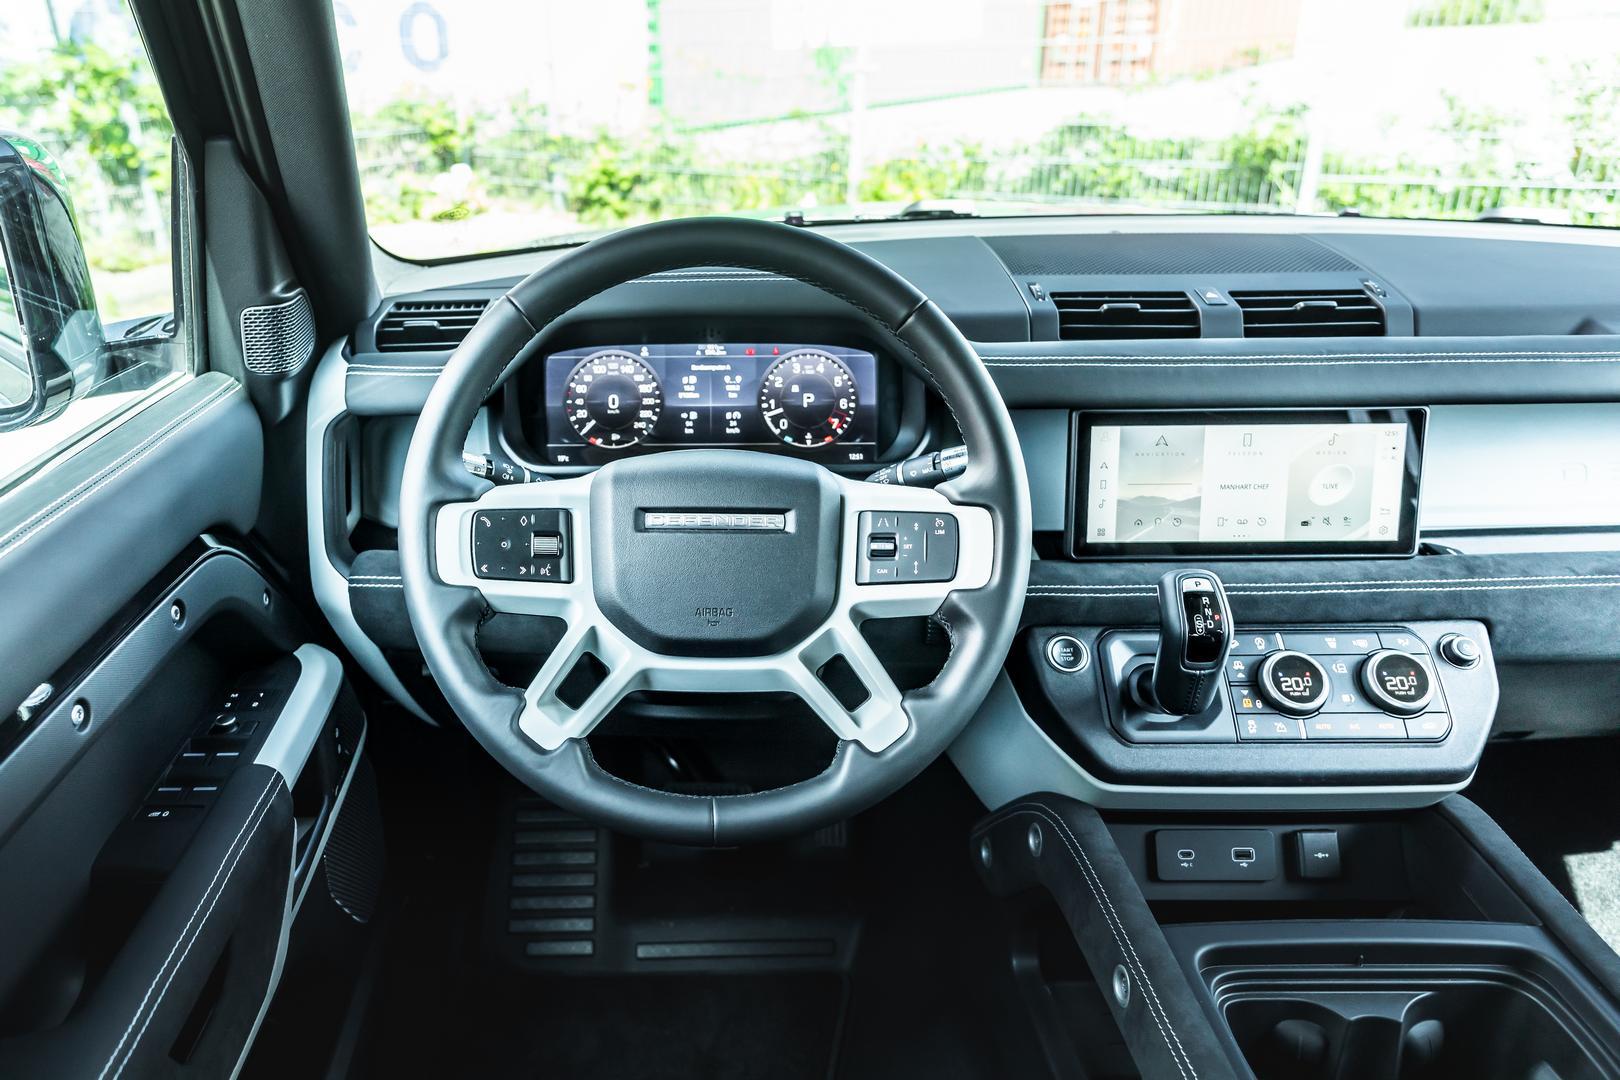 Manhart Defender steering wheel